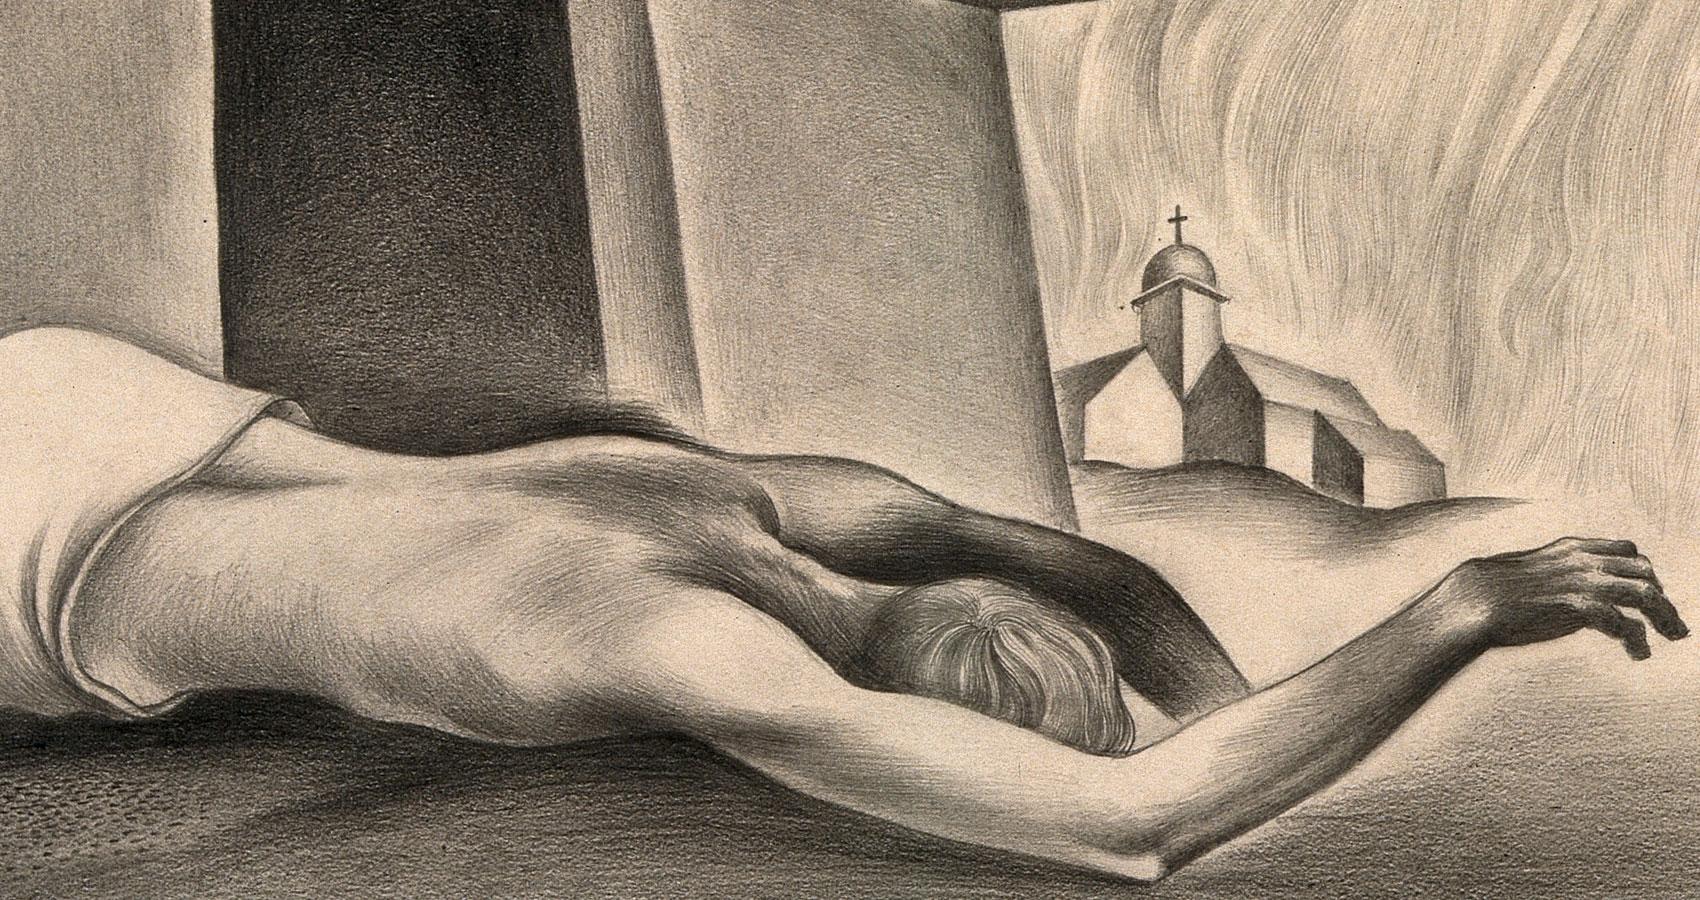 Suicidio, written by Robin McNamara at Spillwords.com